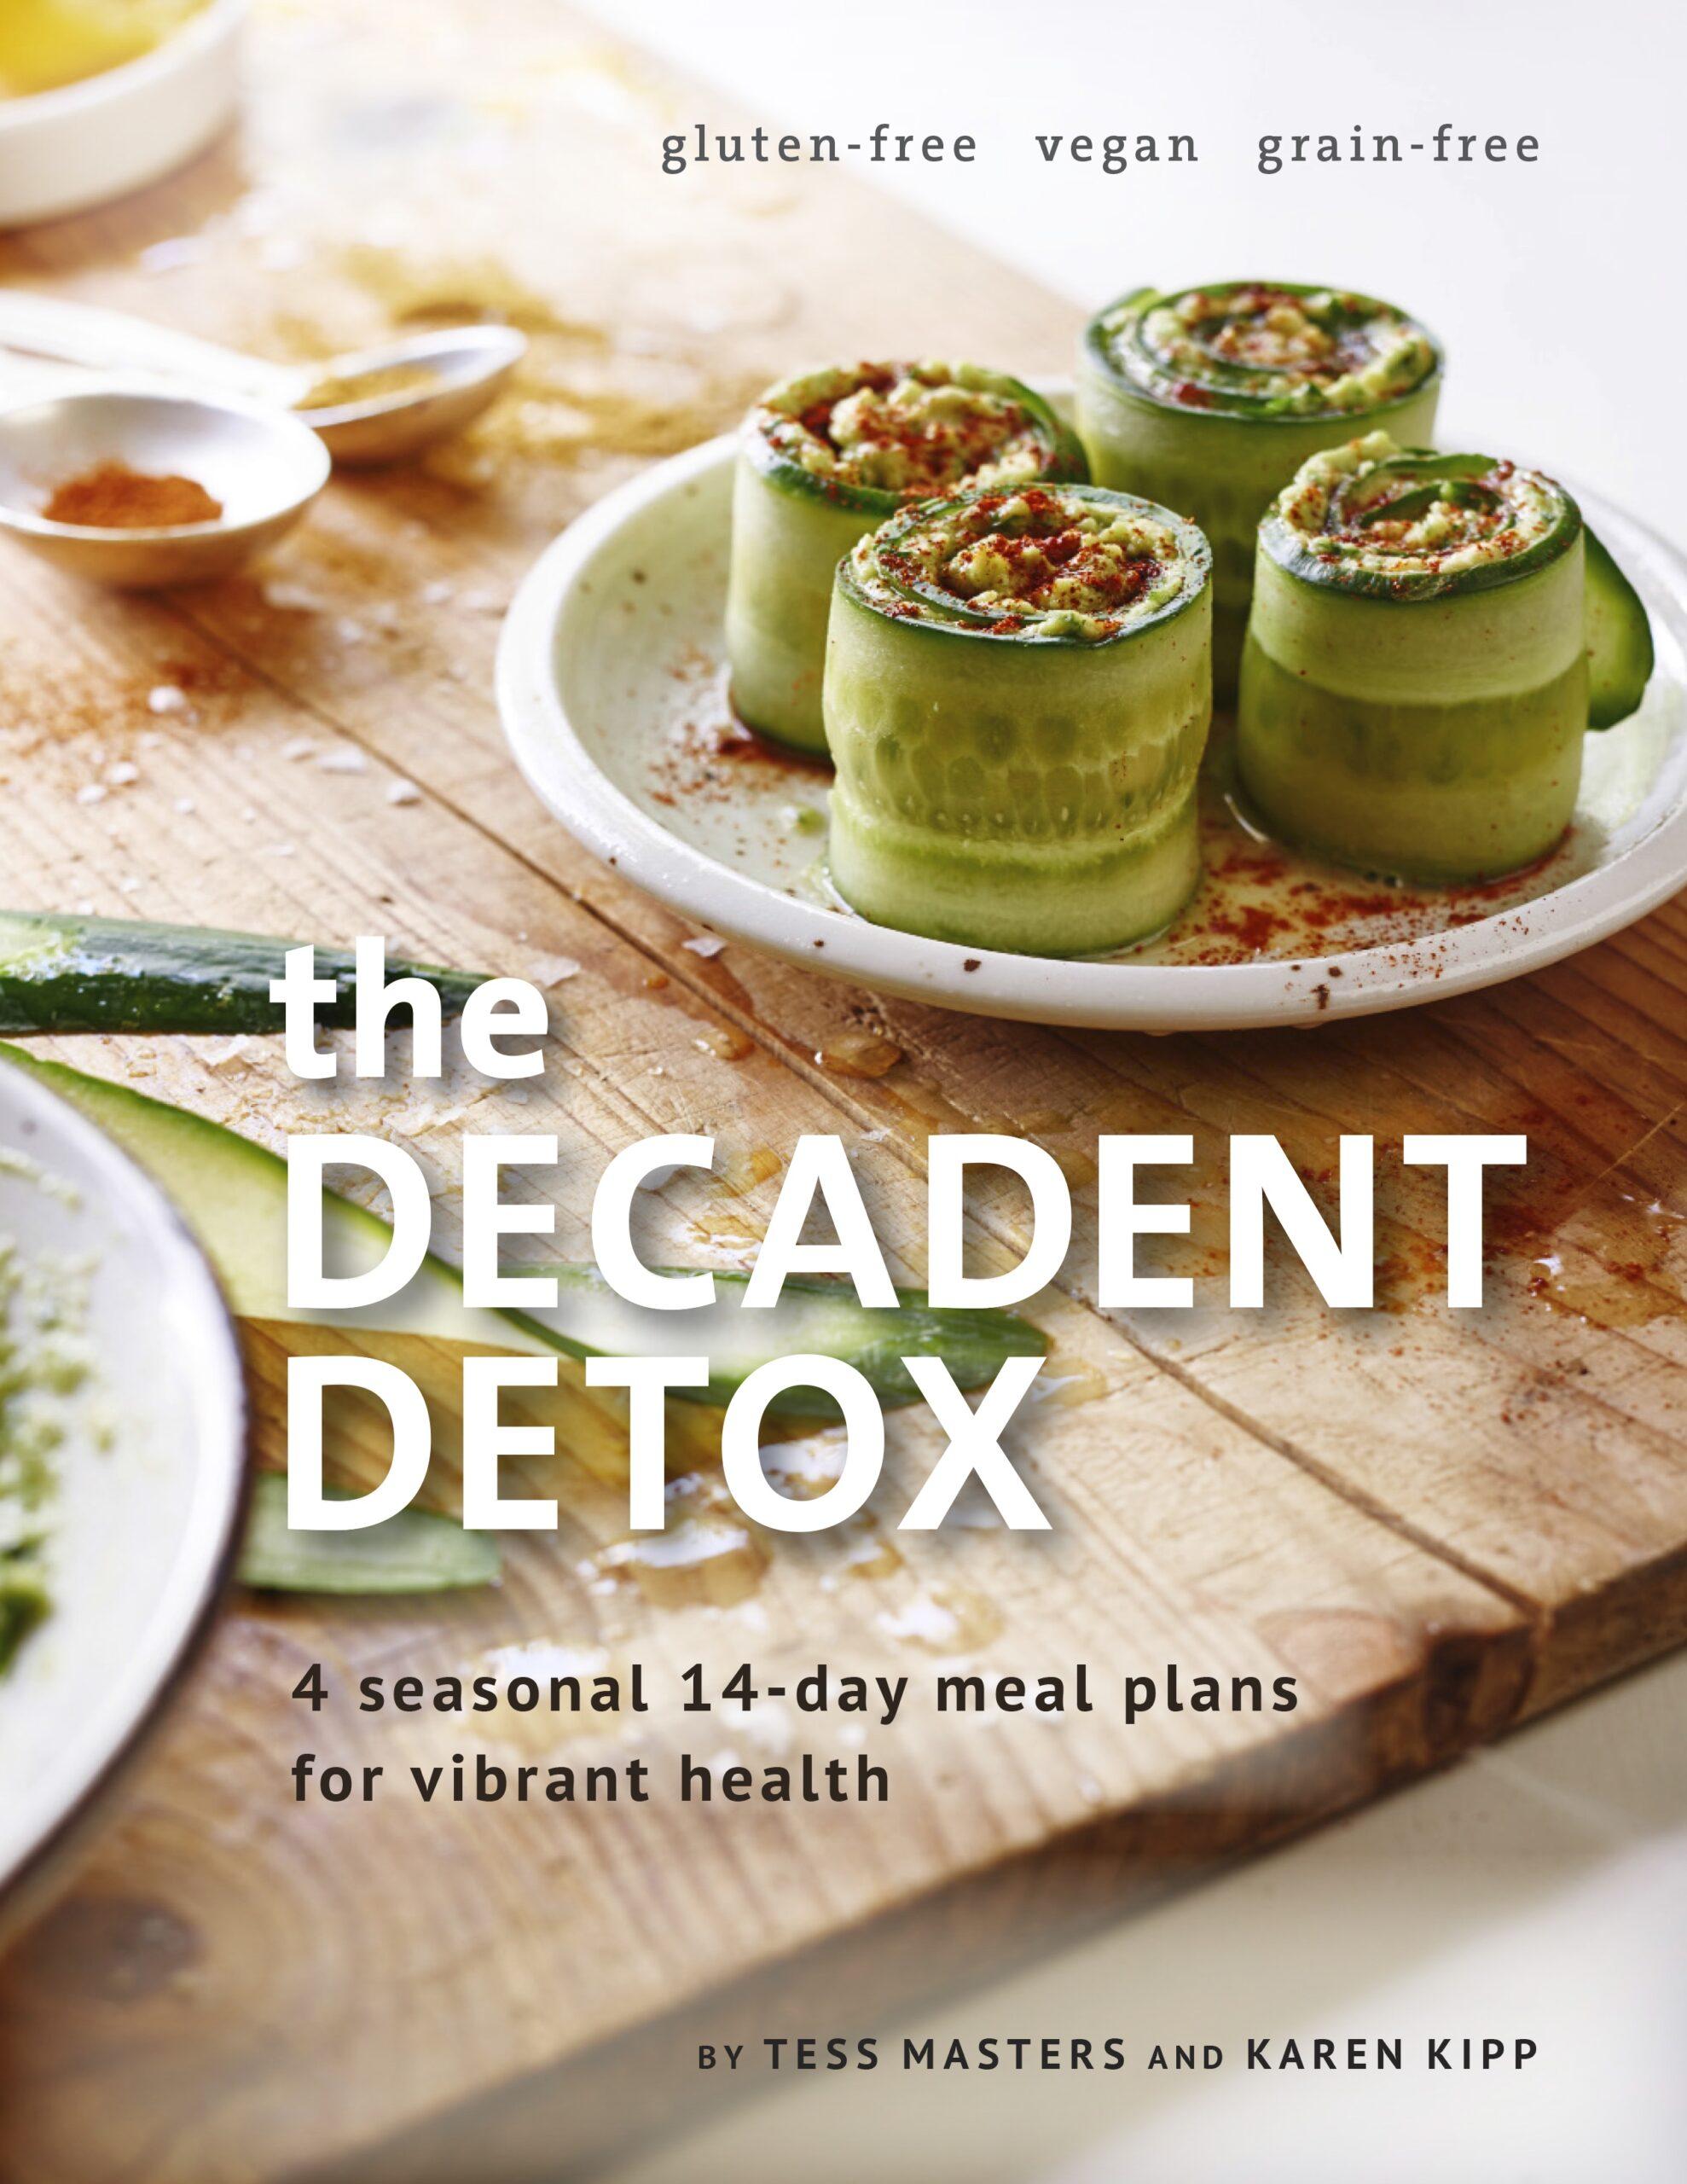 The Decadent Detox Book Cover